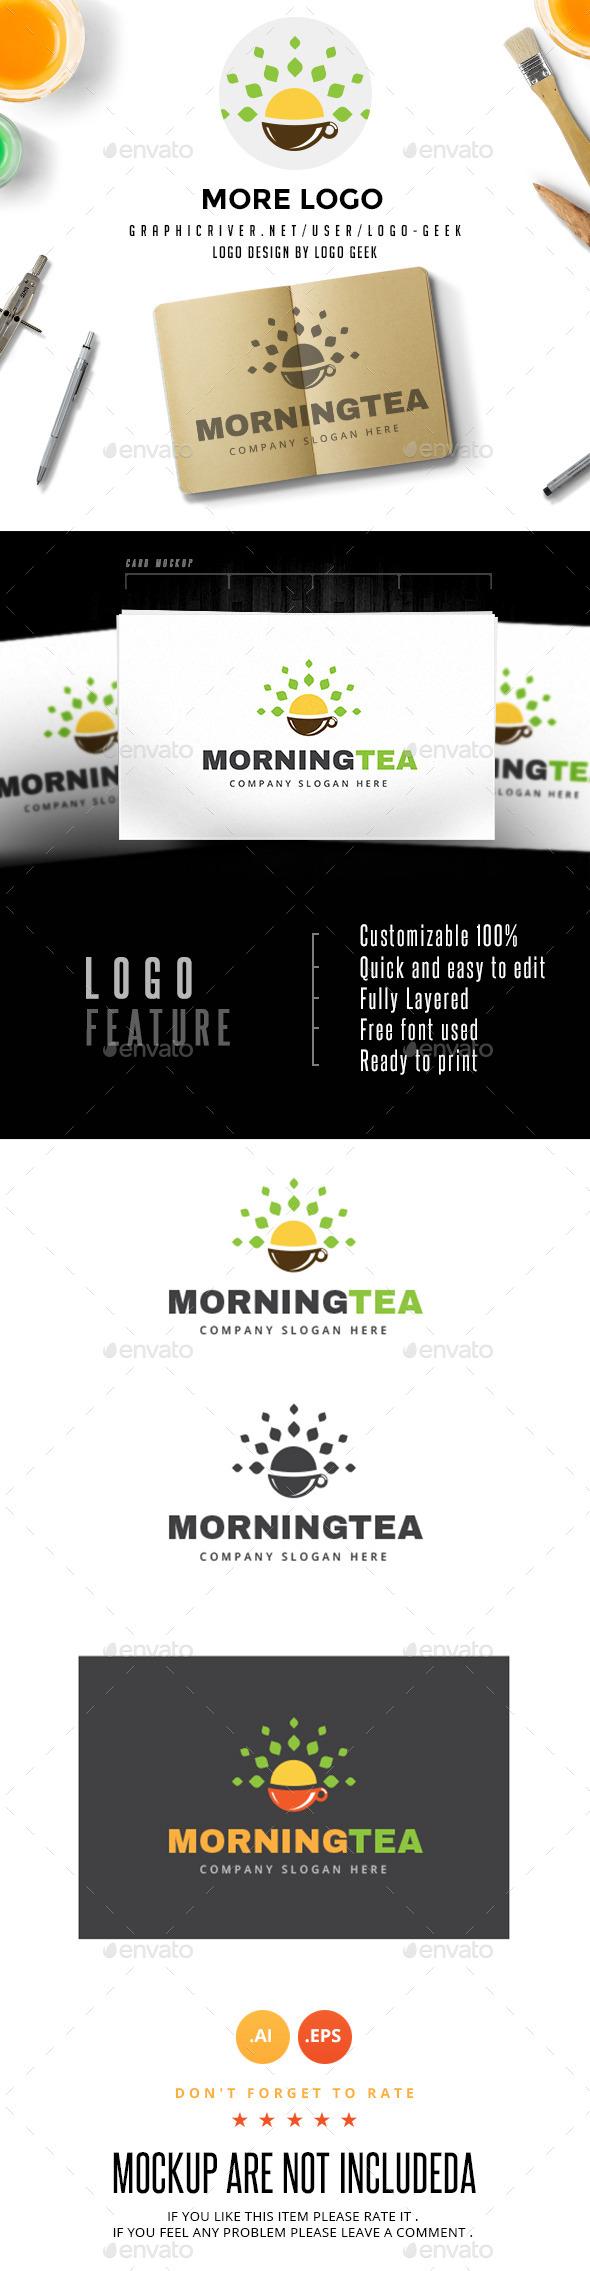 GraphicRiver Morning Tea 10597052